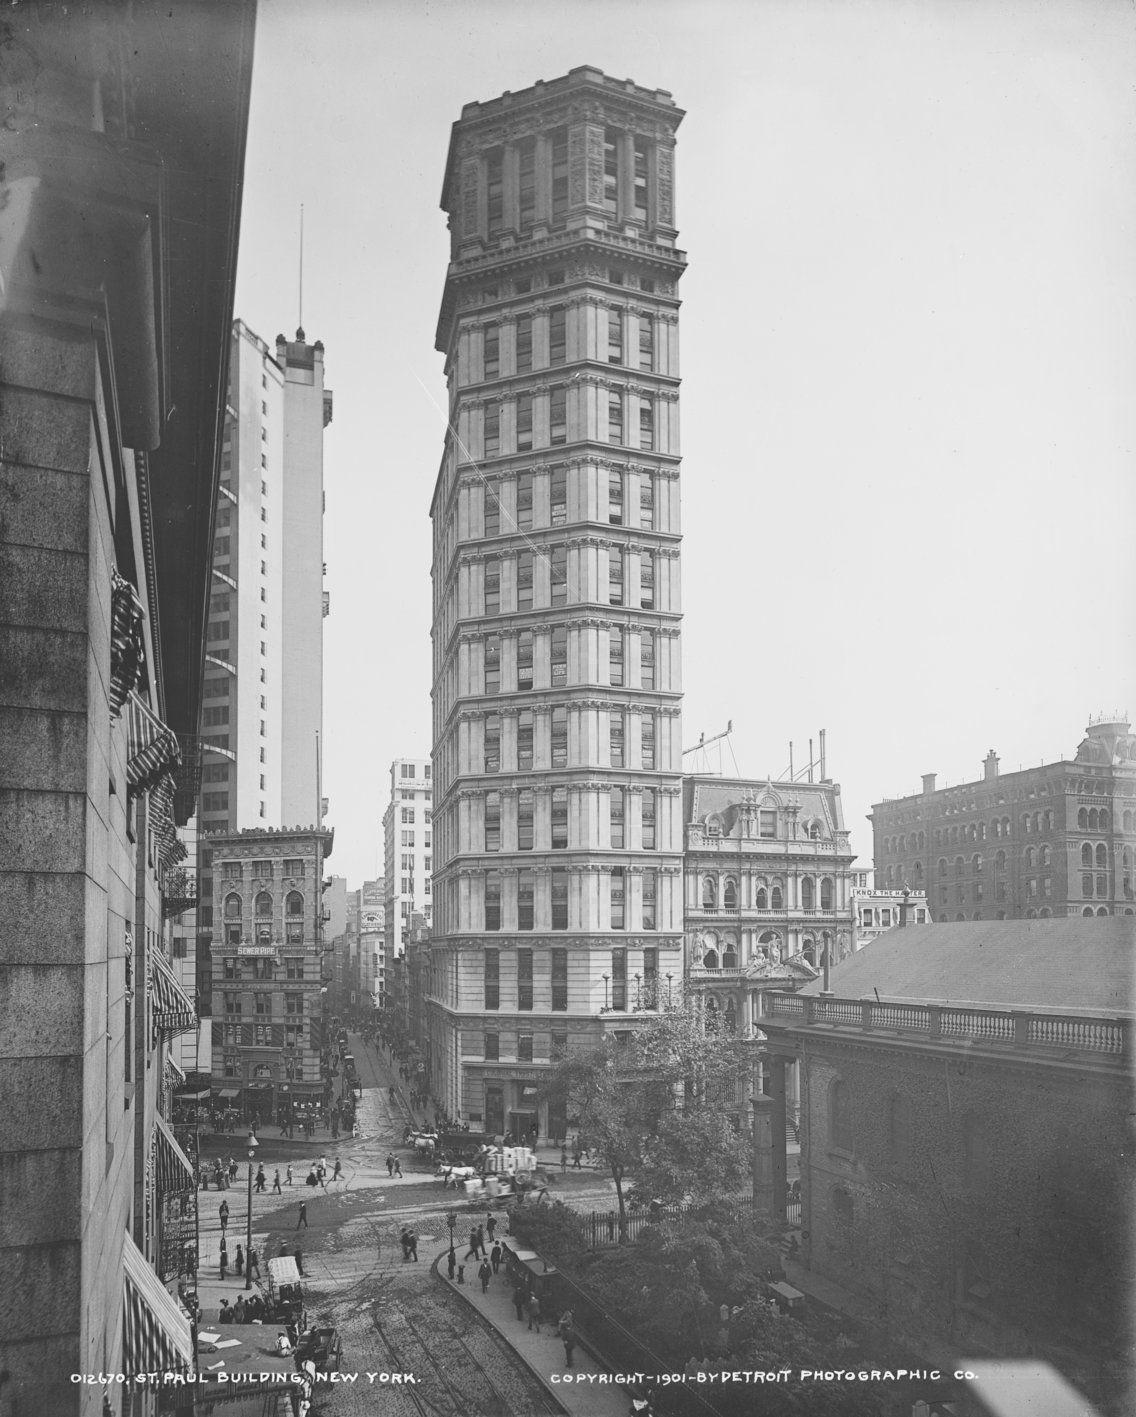 Demolished New York Buildings New York City Buildings New York Buildings New York Architecture